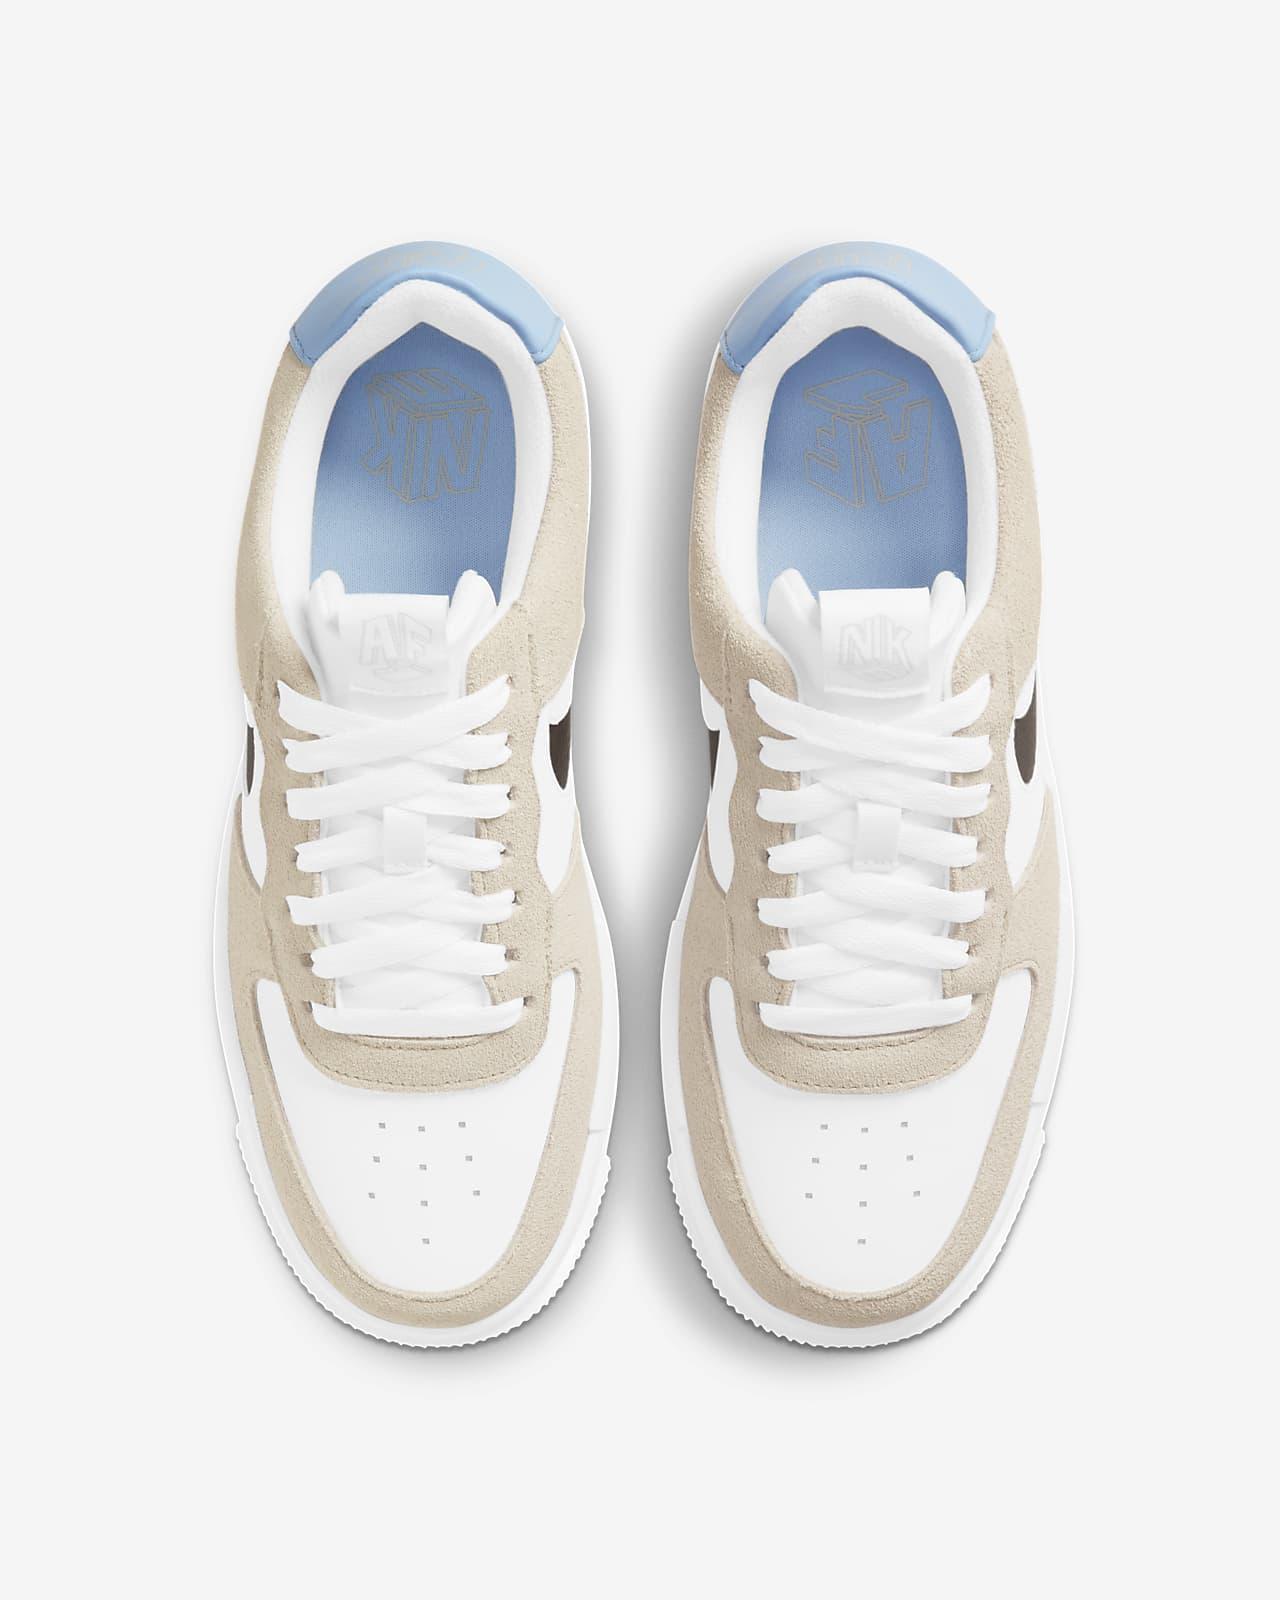 Nike Air Force 1 Pixel Women's Shoes